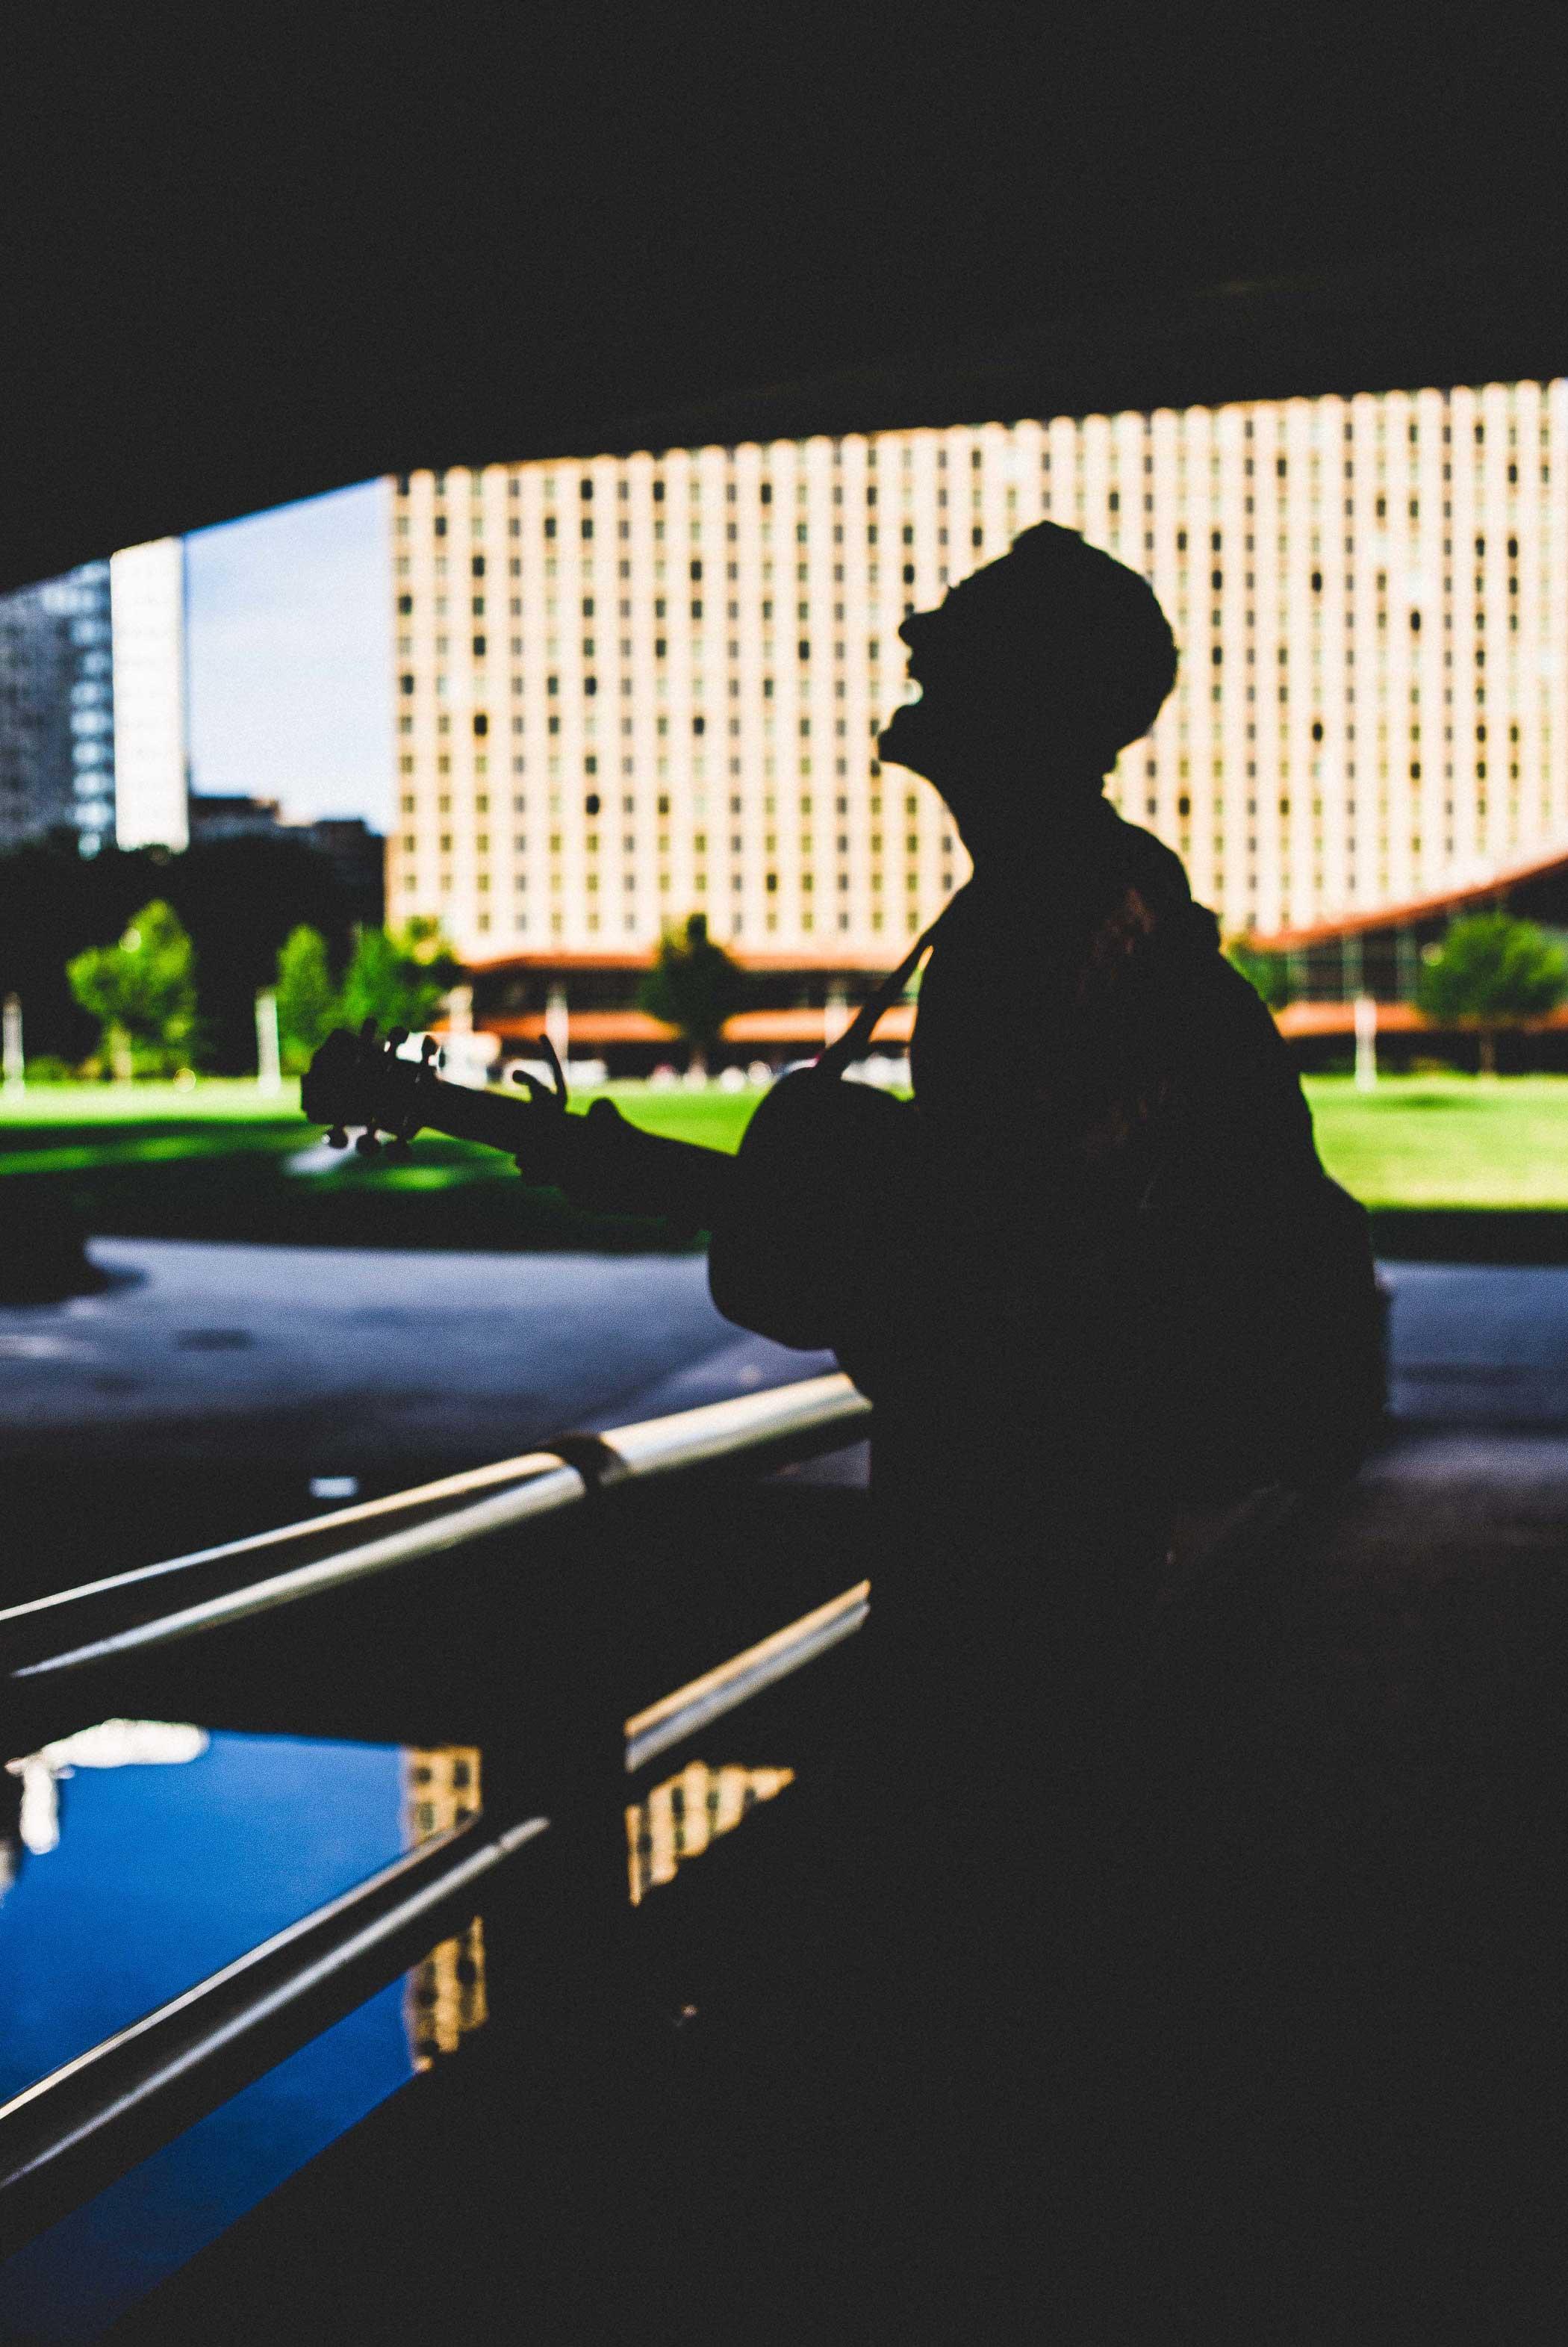 A man play guitar under a bridge on June 24, 2015.